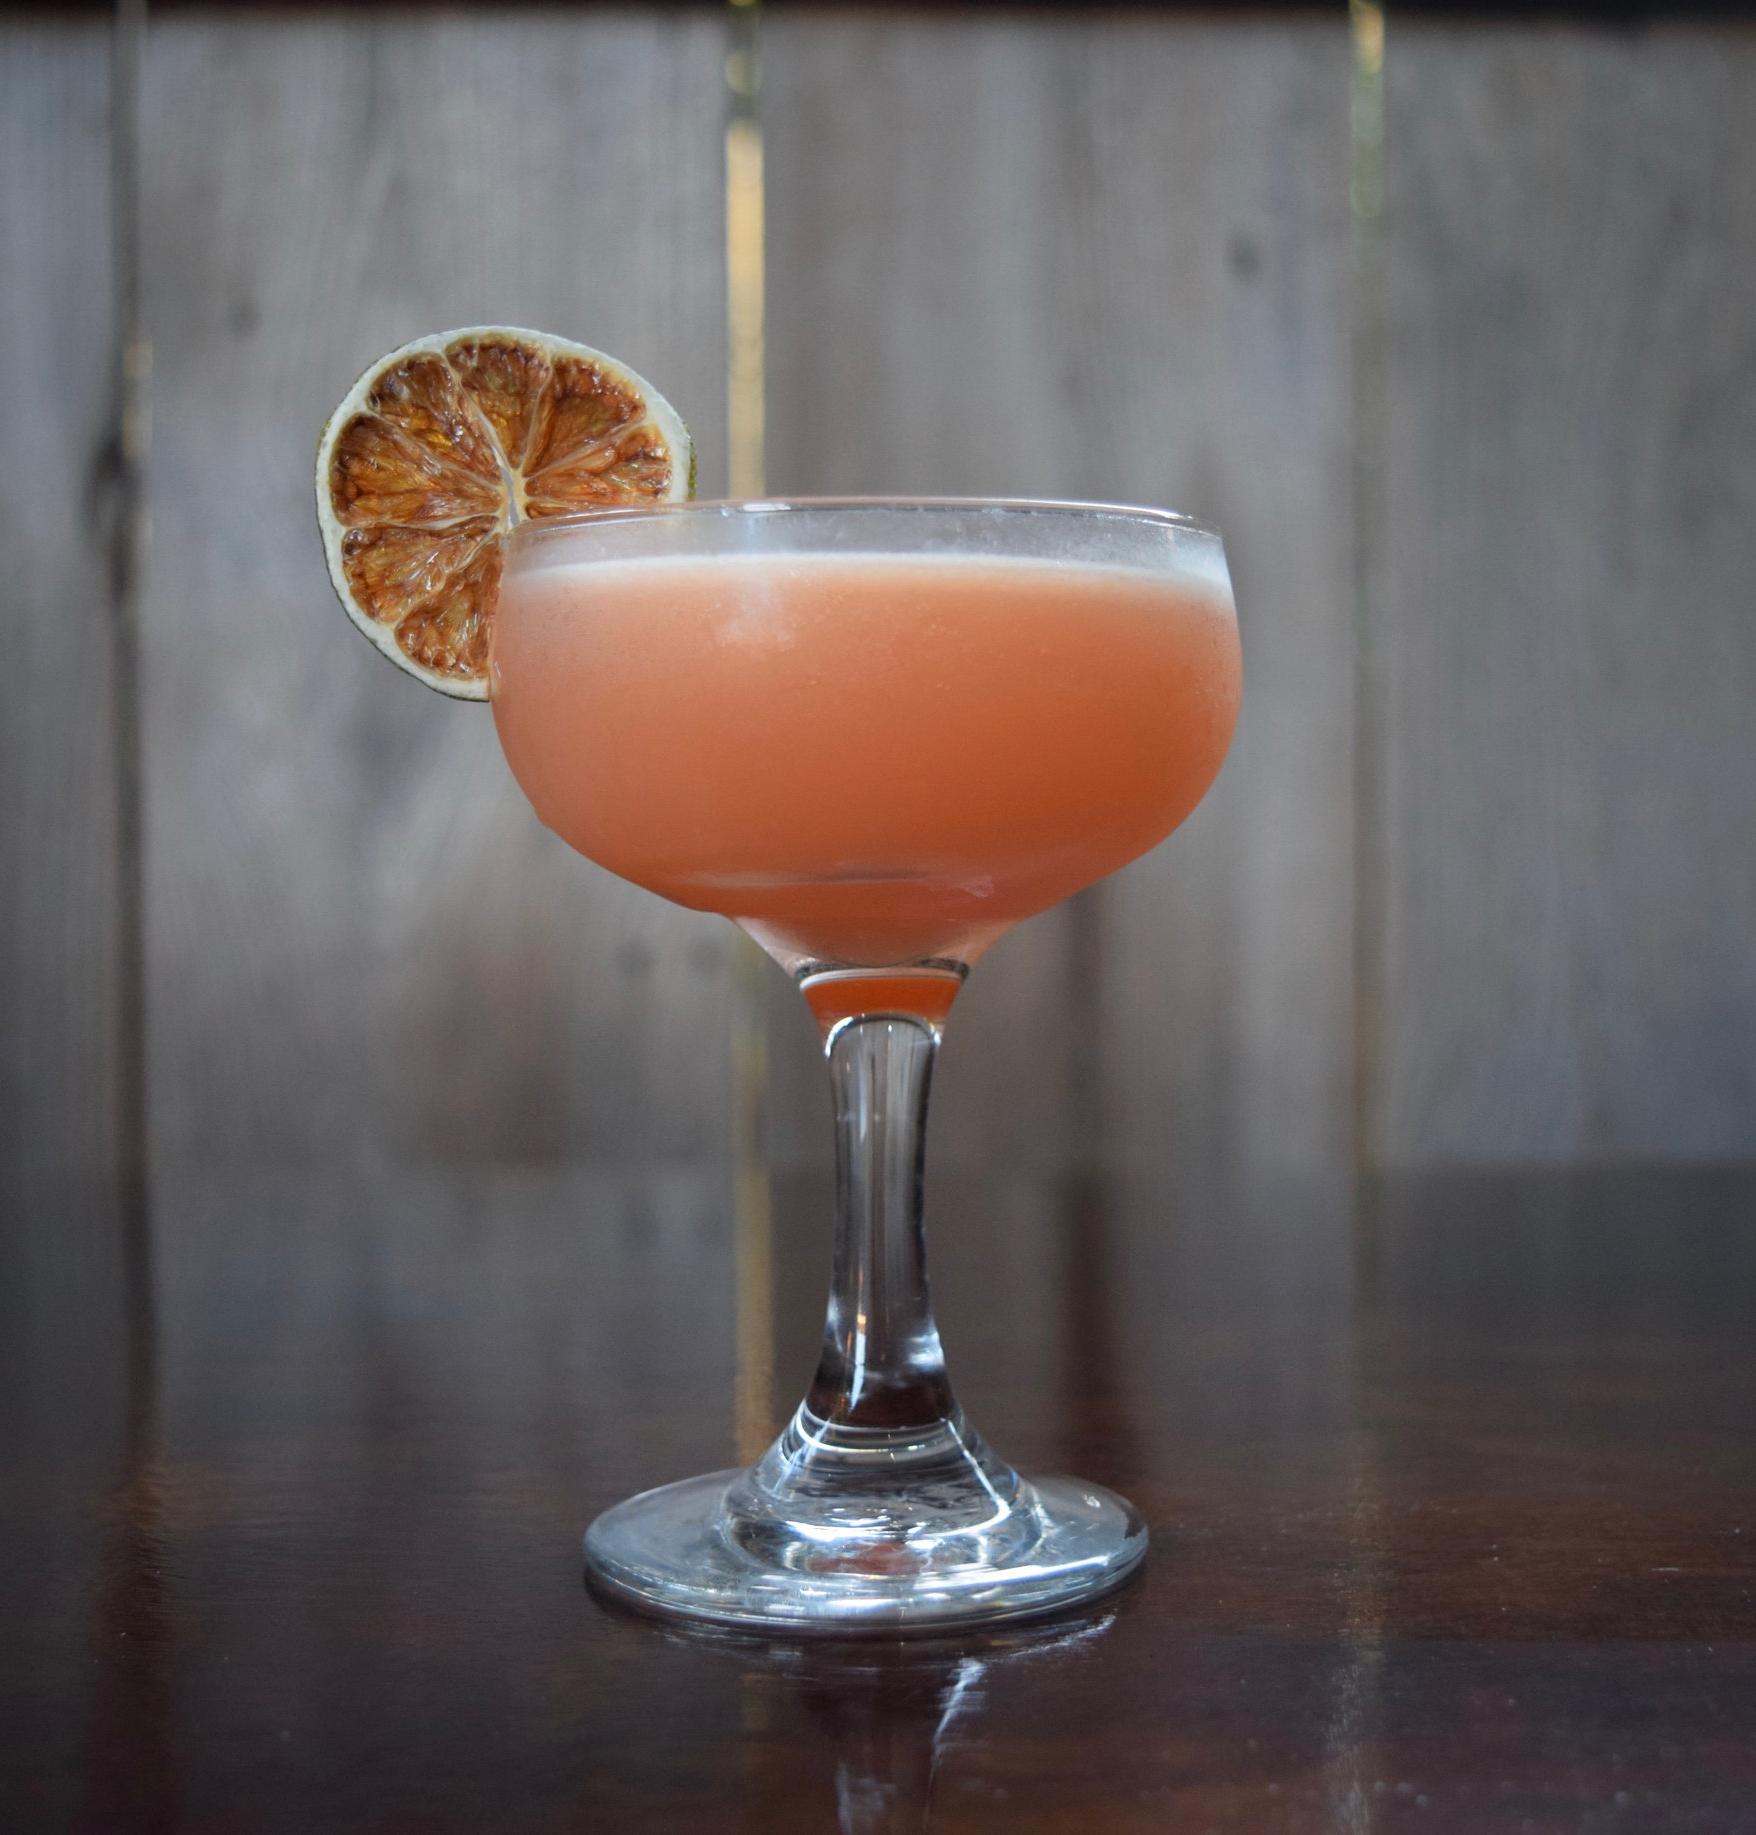 CABANA BOY - 1.5 oz gin or vodka1/4 oz campari1/2 oz nostrum pineapple turmeric ginger shrub3/4 oz fresh lime juice1/4 oz orgeatShake with ice and strain.